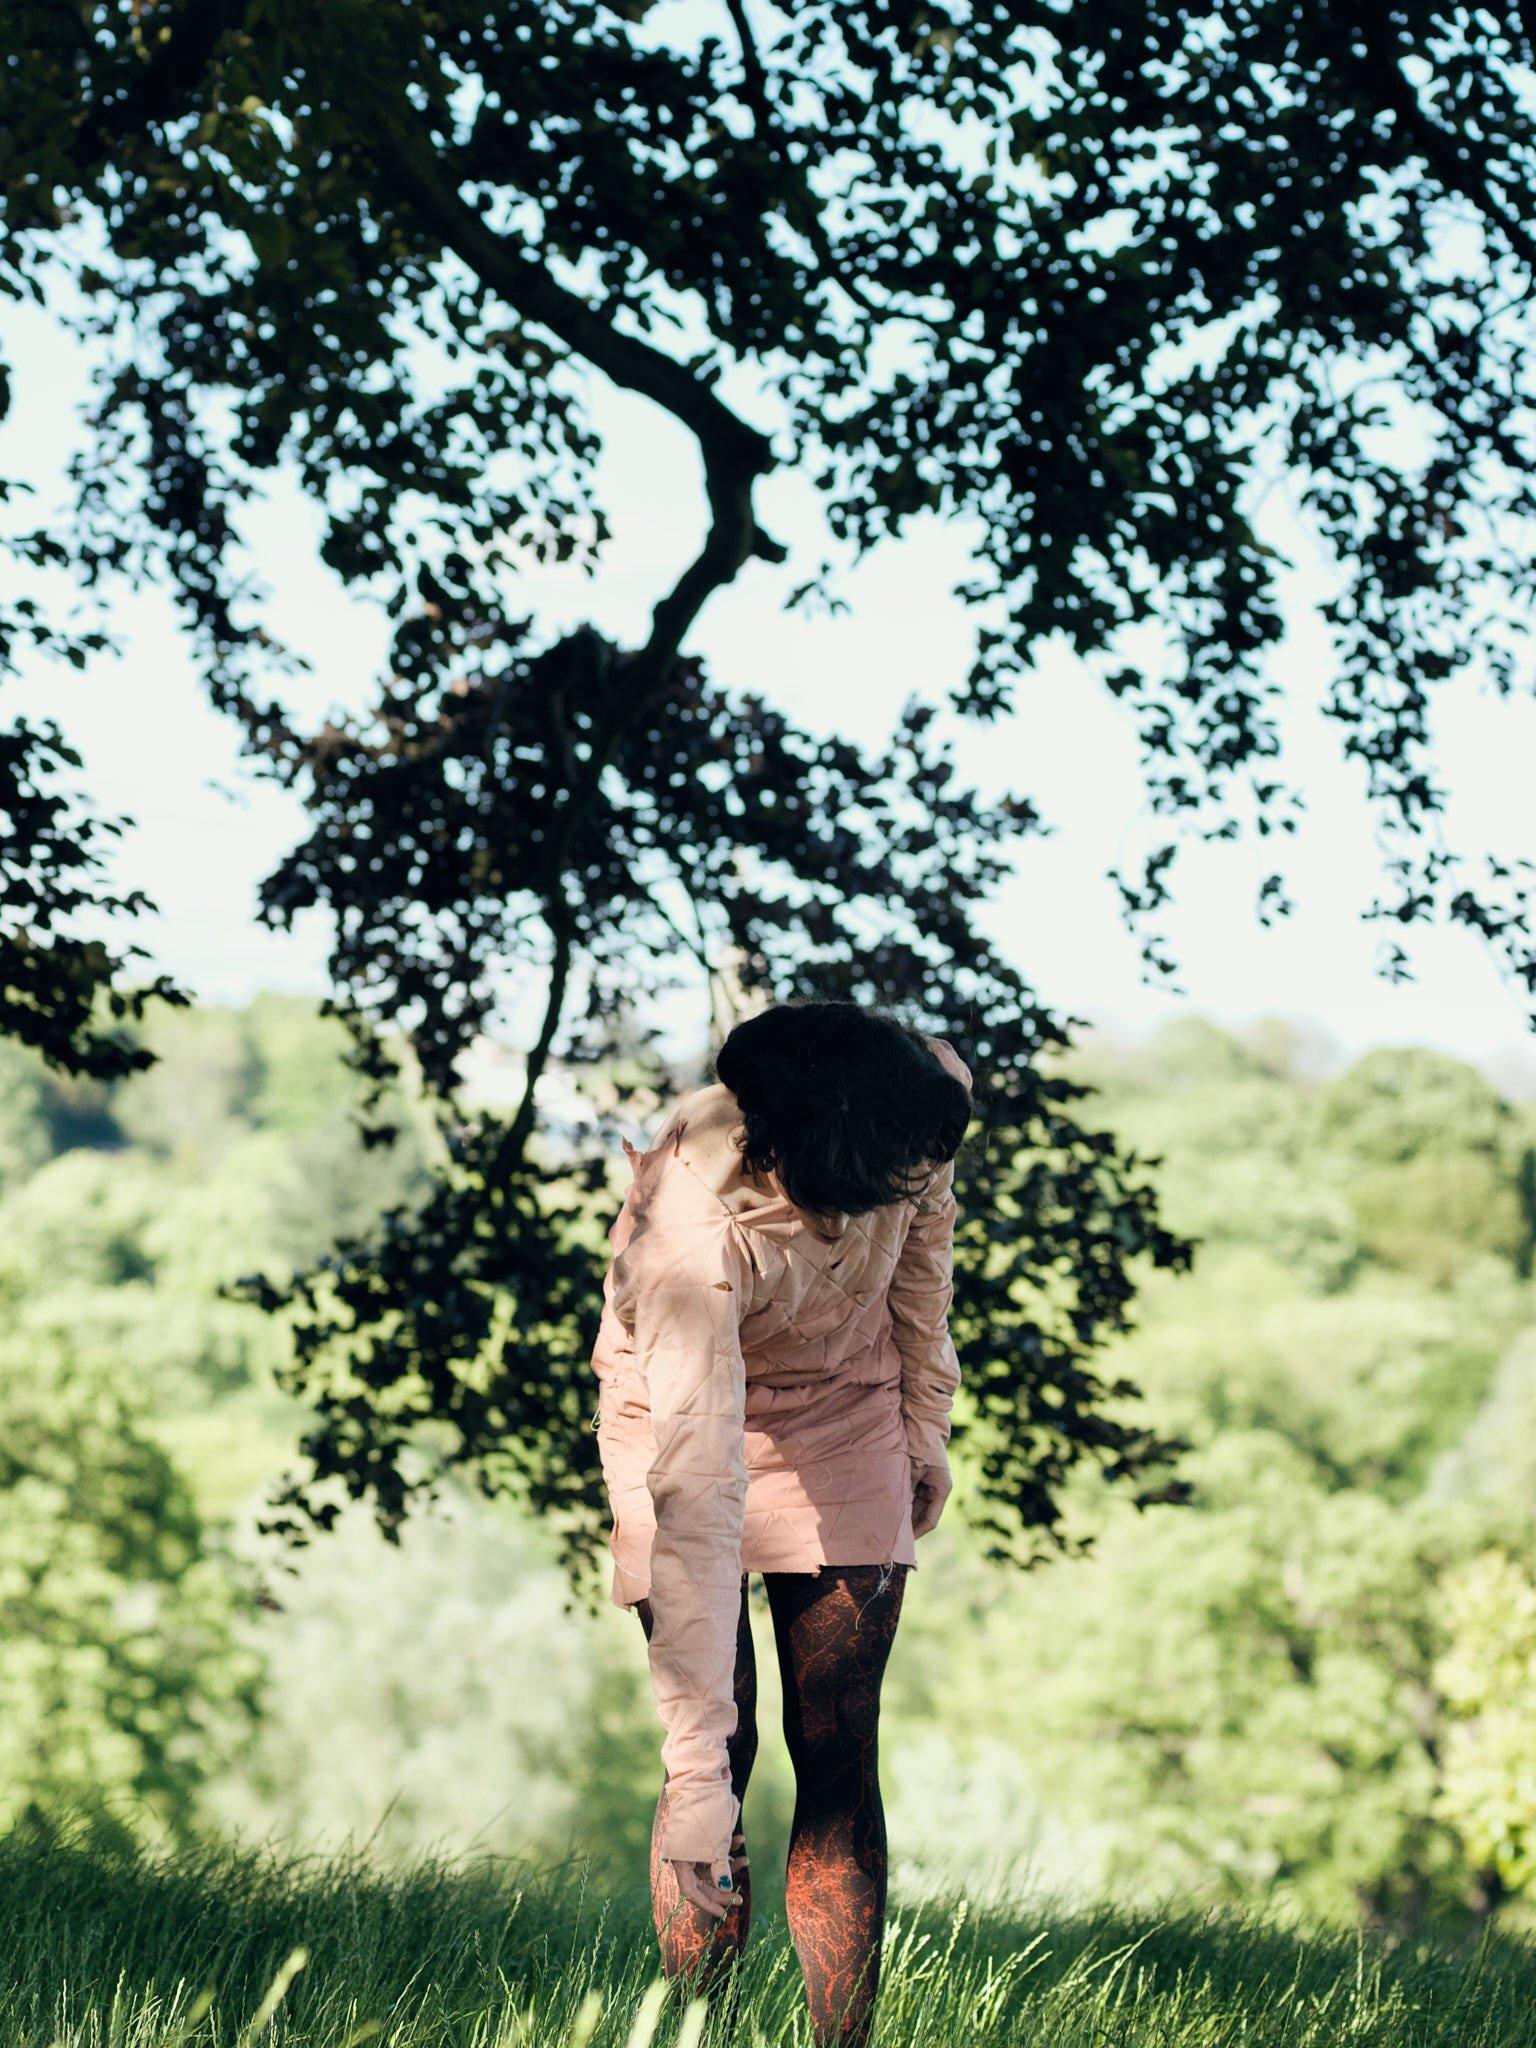 Adam Christensen – photographed at Hampstead Heath